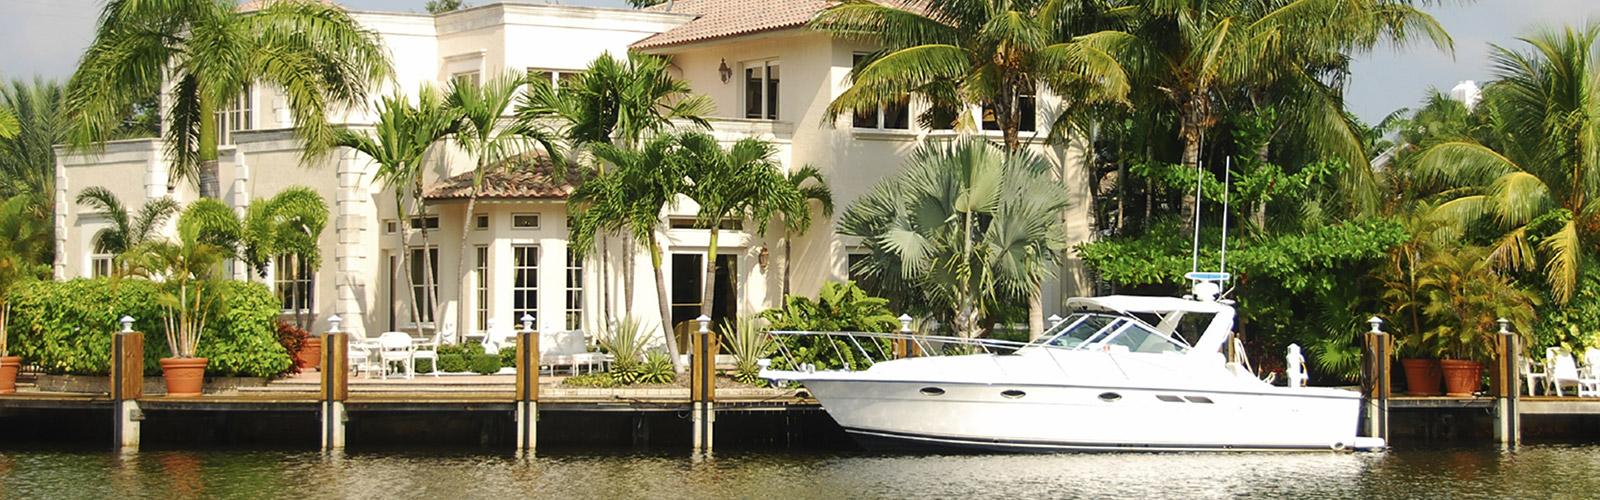 Haus kaufen Florida – Immobilien Naples Bonita Springs